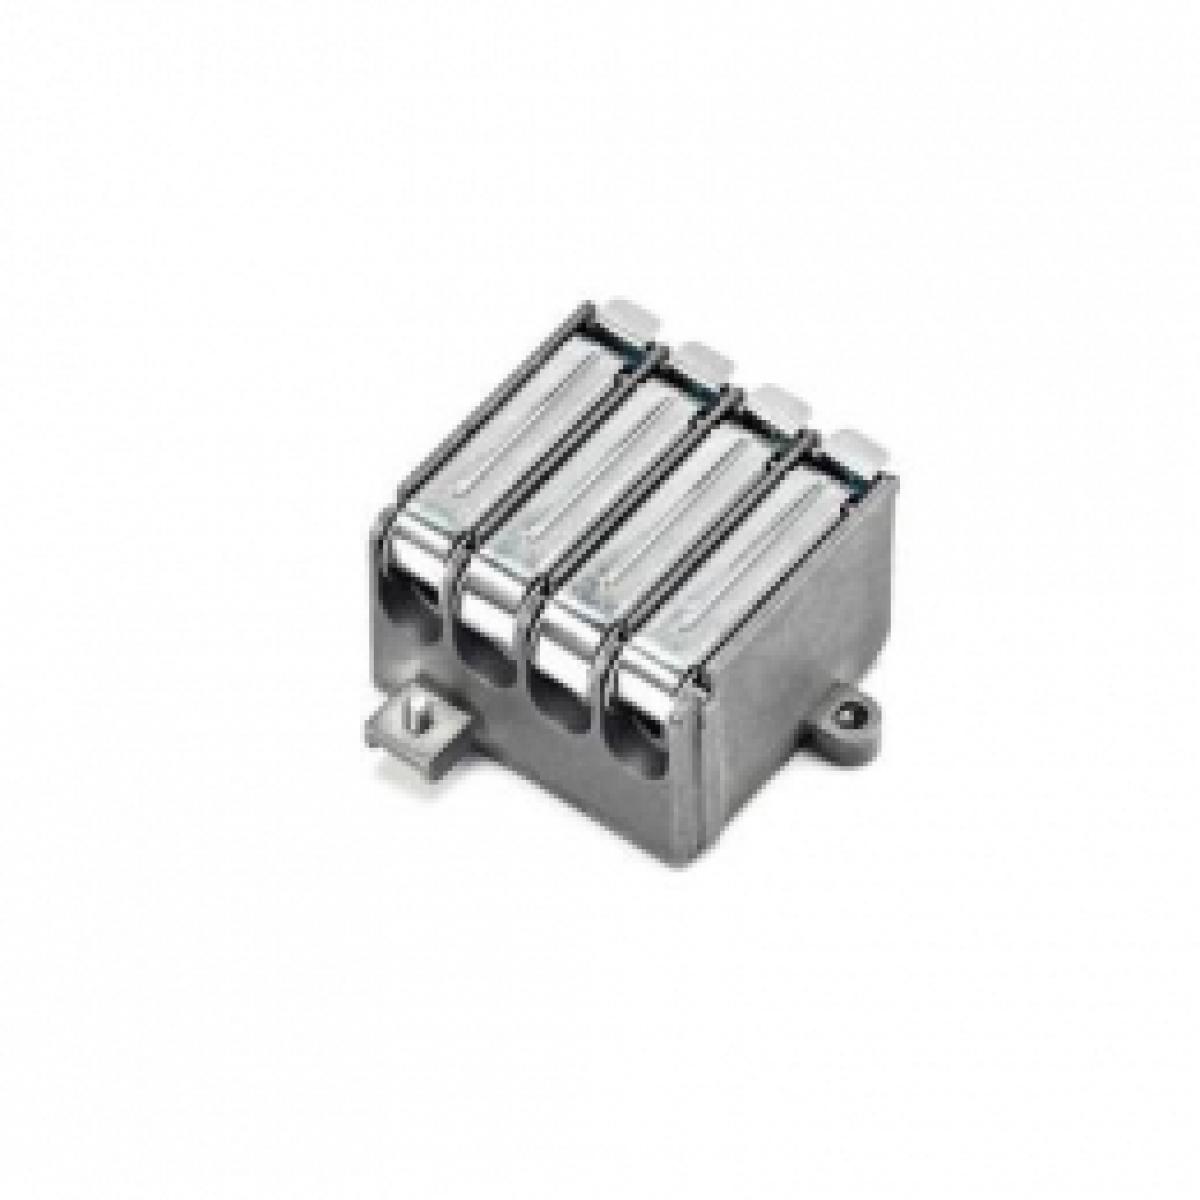 Deviatore cd1-14 1 via 14db 220814 fracarro